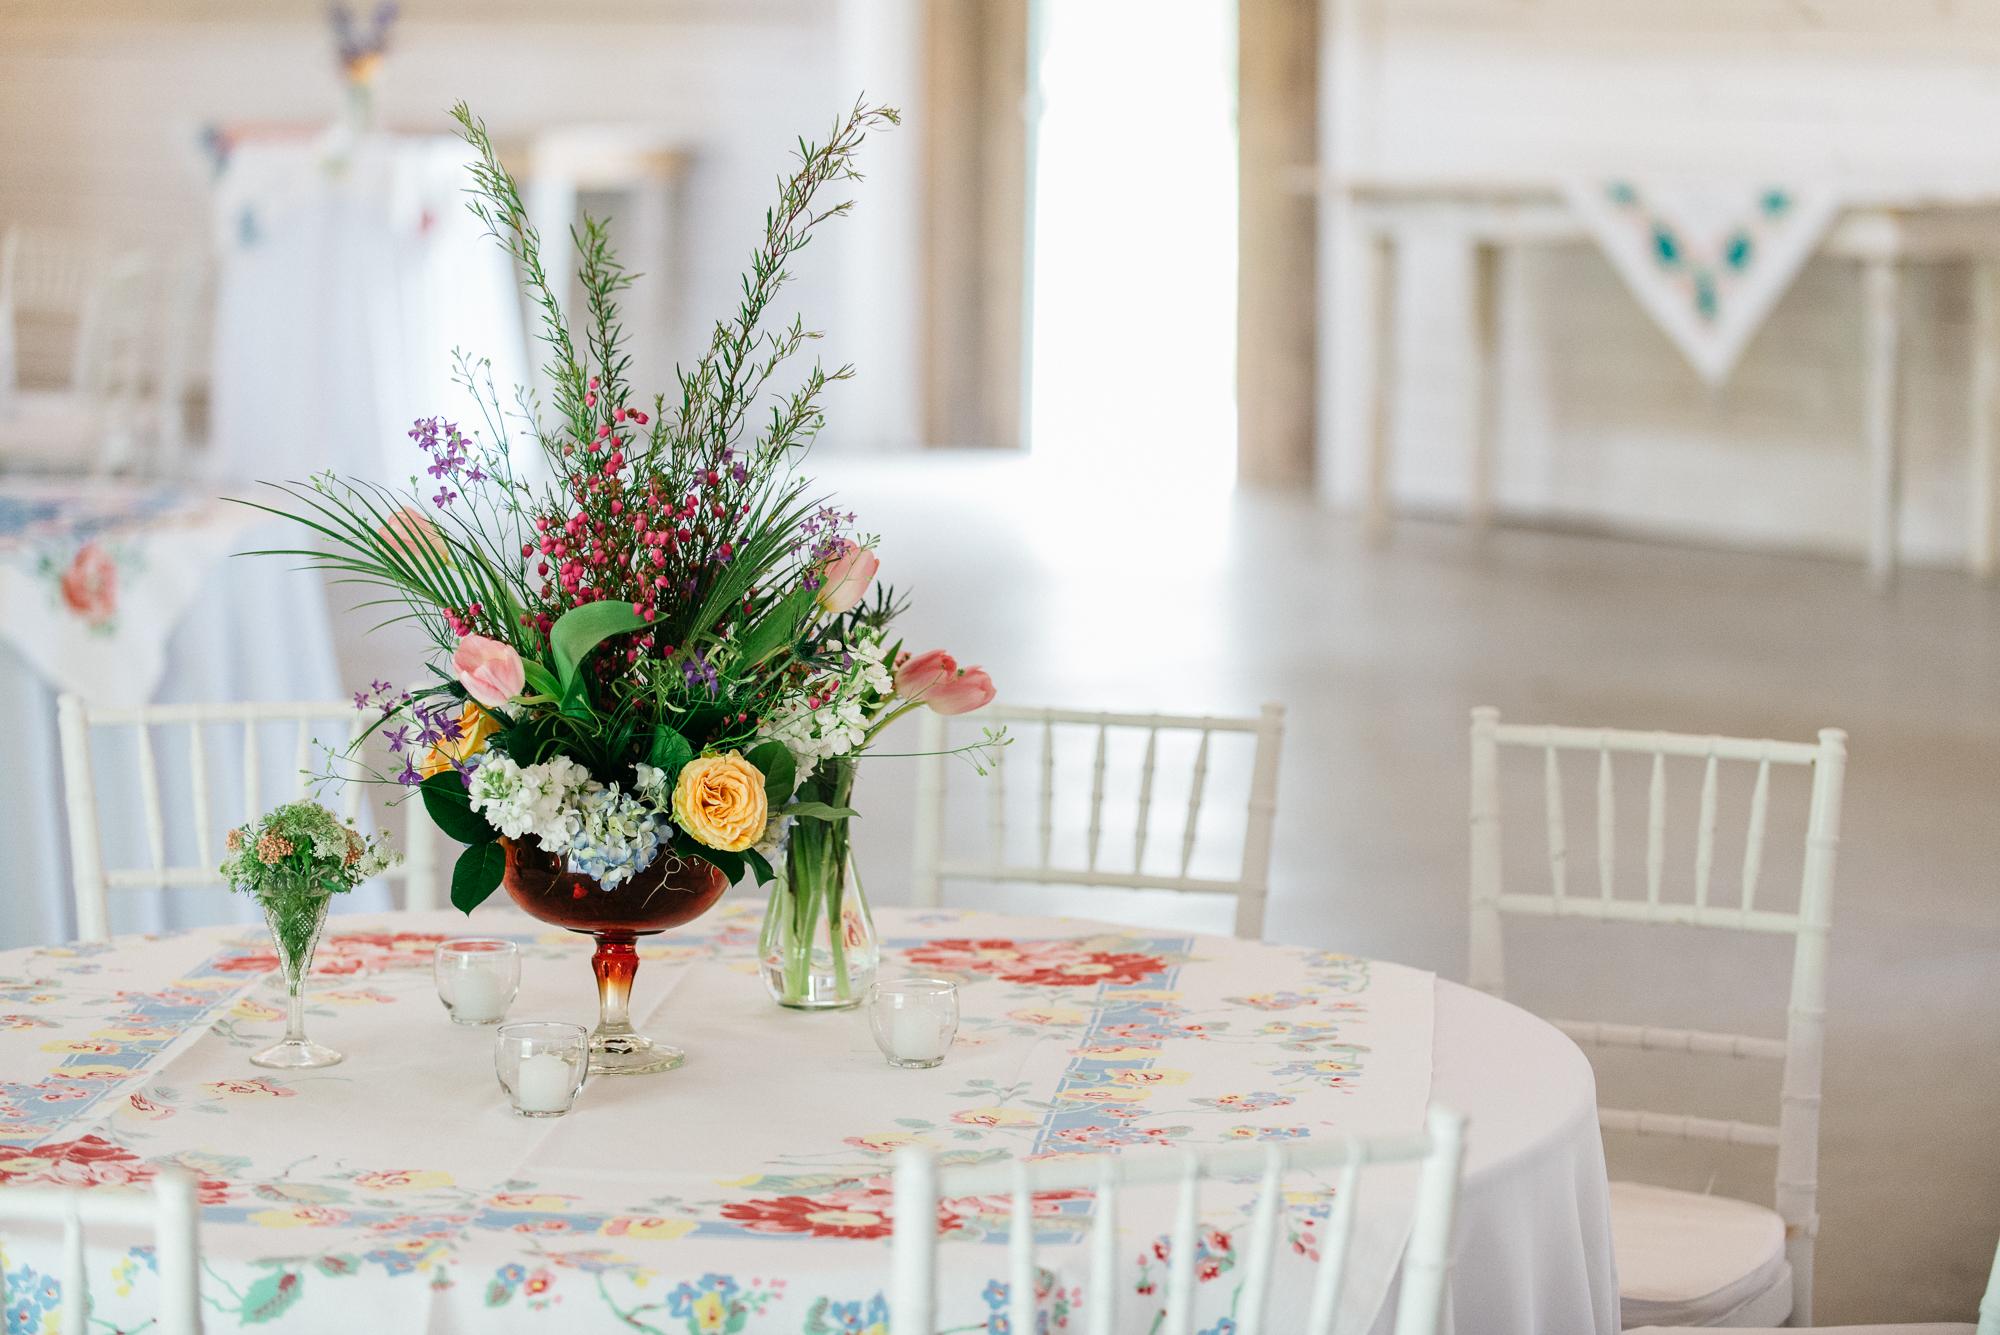 Langley-Smith-wedding-blog-1.jpg